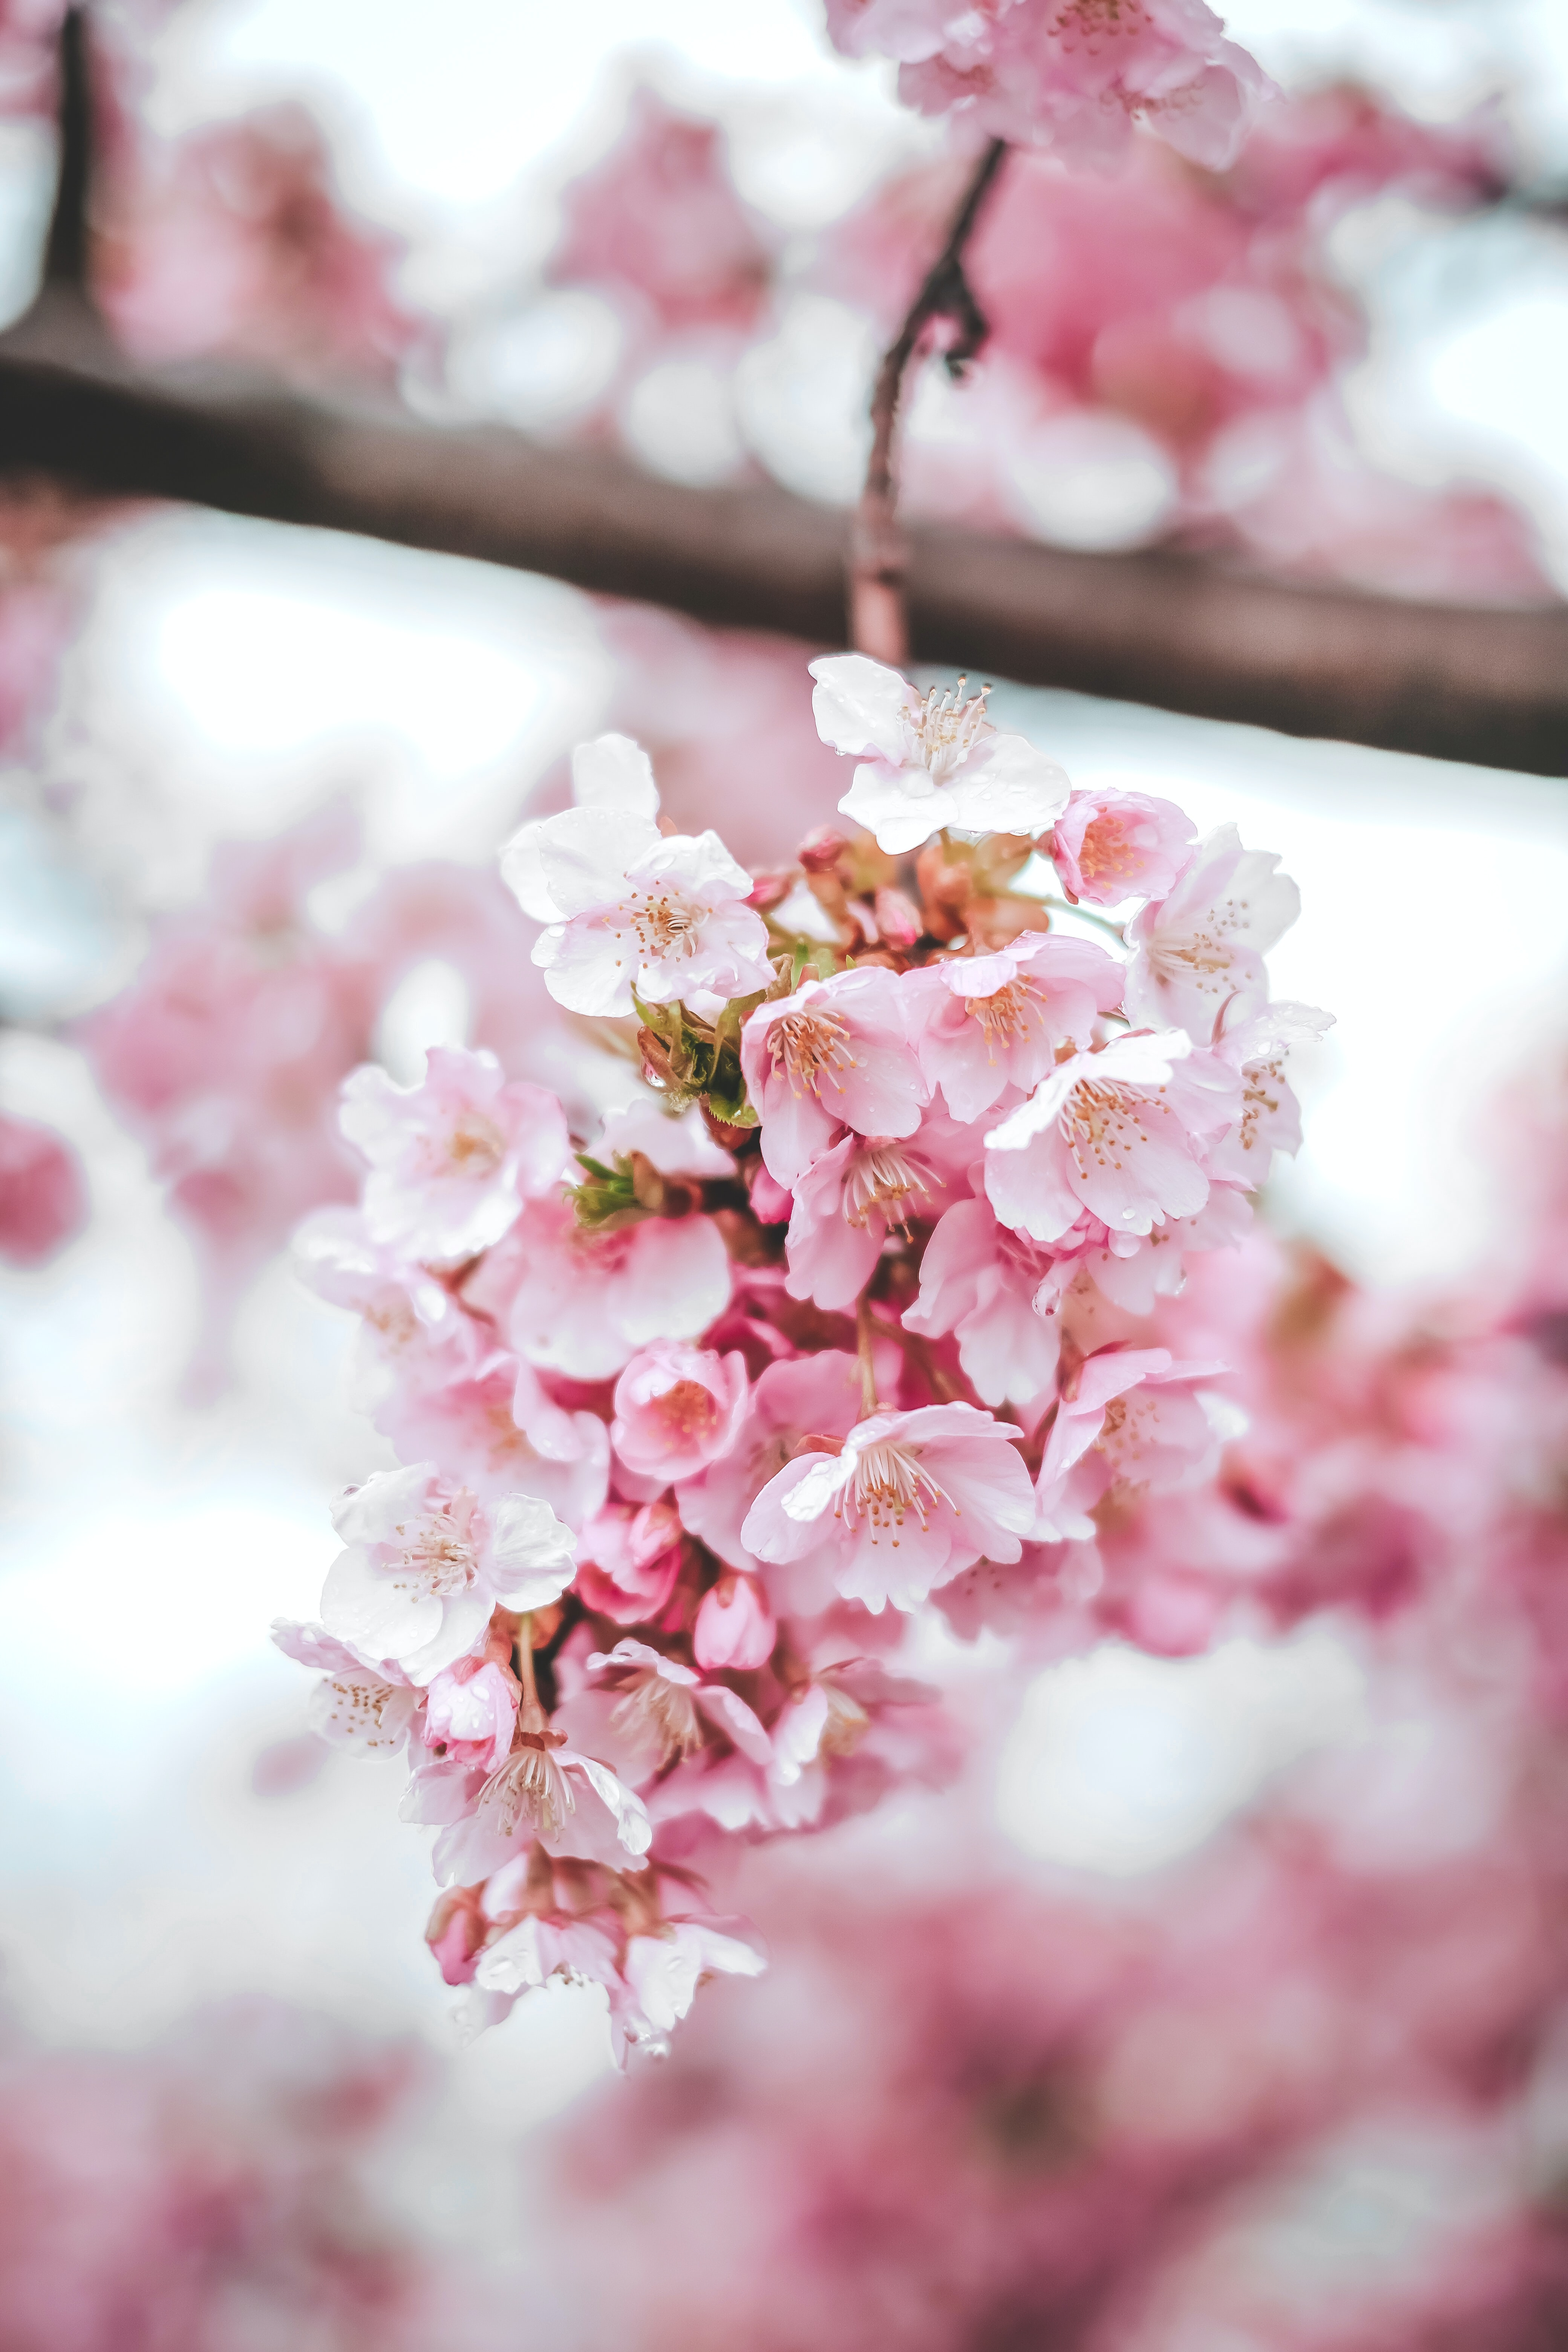 82071 Screensavers and Wallpapers Sakura for phone. Download Flowers, Pink, Sakura, Macro, Bloom, Flowering pictures for free